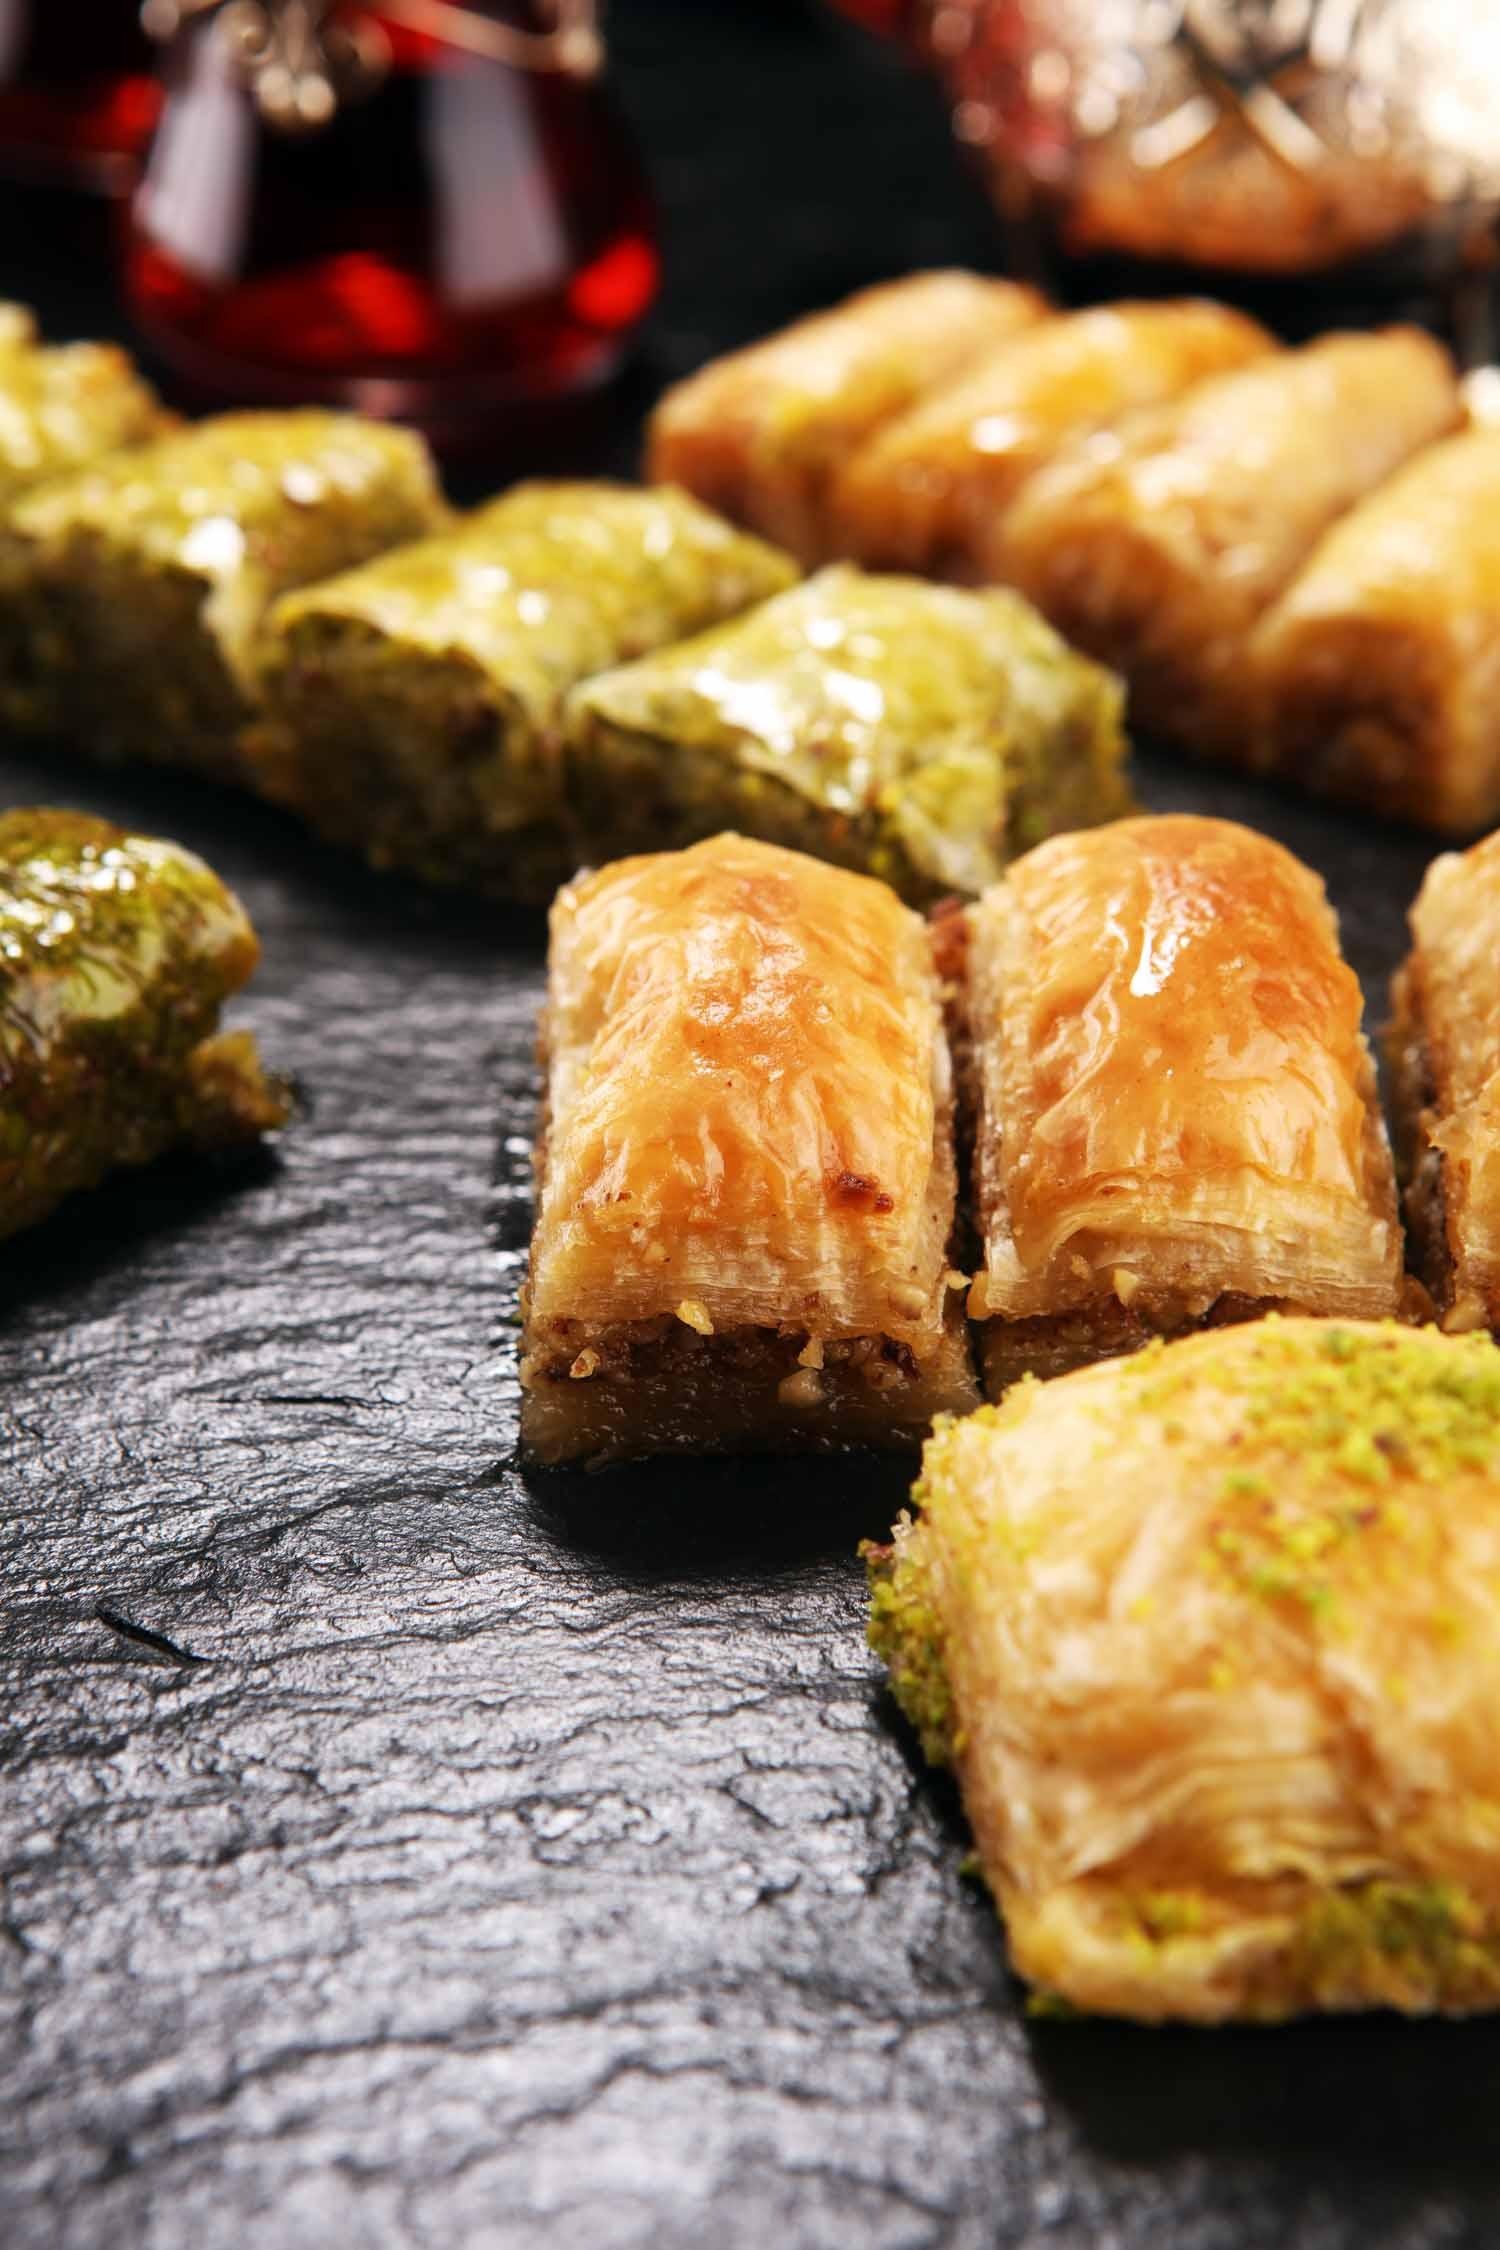 Jordanian cuisine includes a dish similar Turkish Dessert Baklava with pistachio.